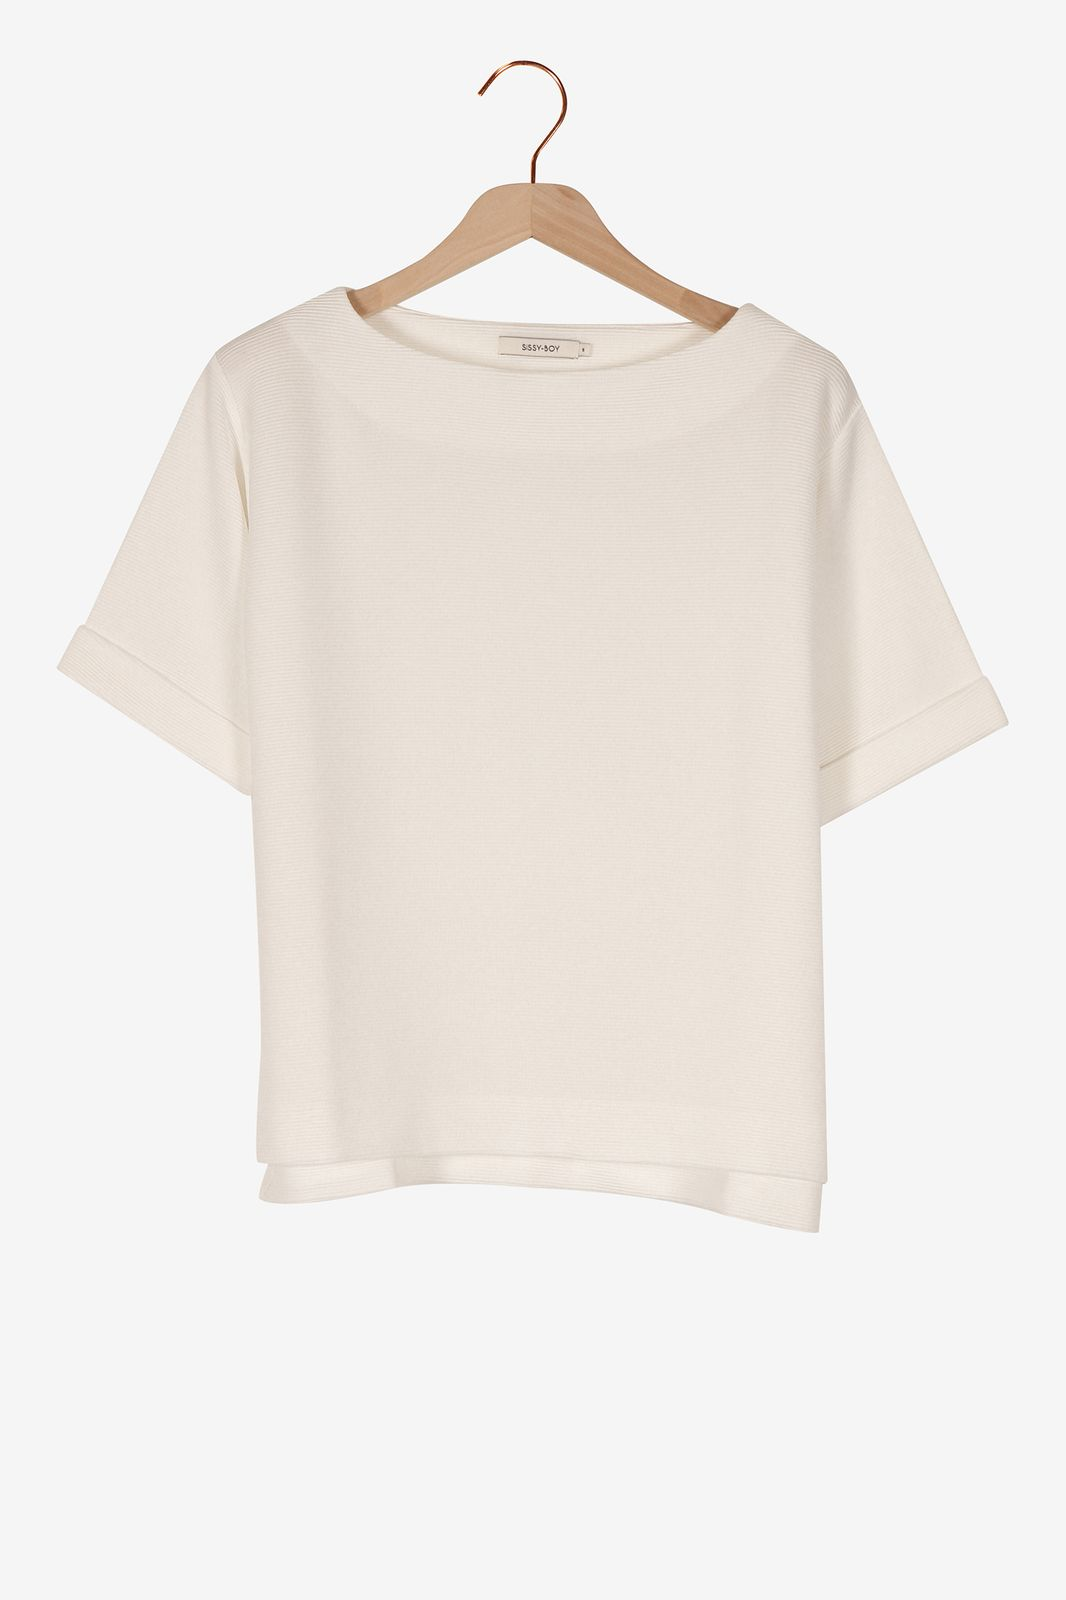 Wit t-shirt met rib structuur